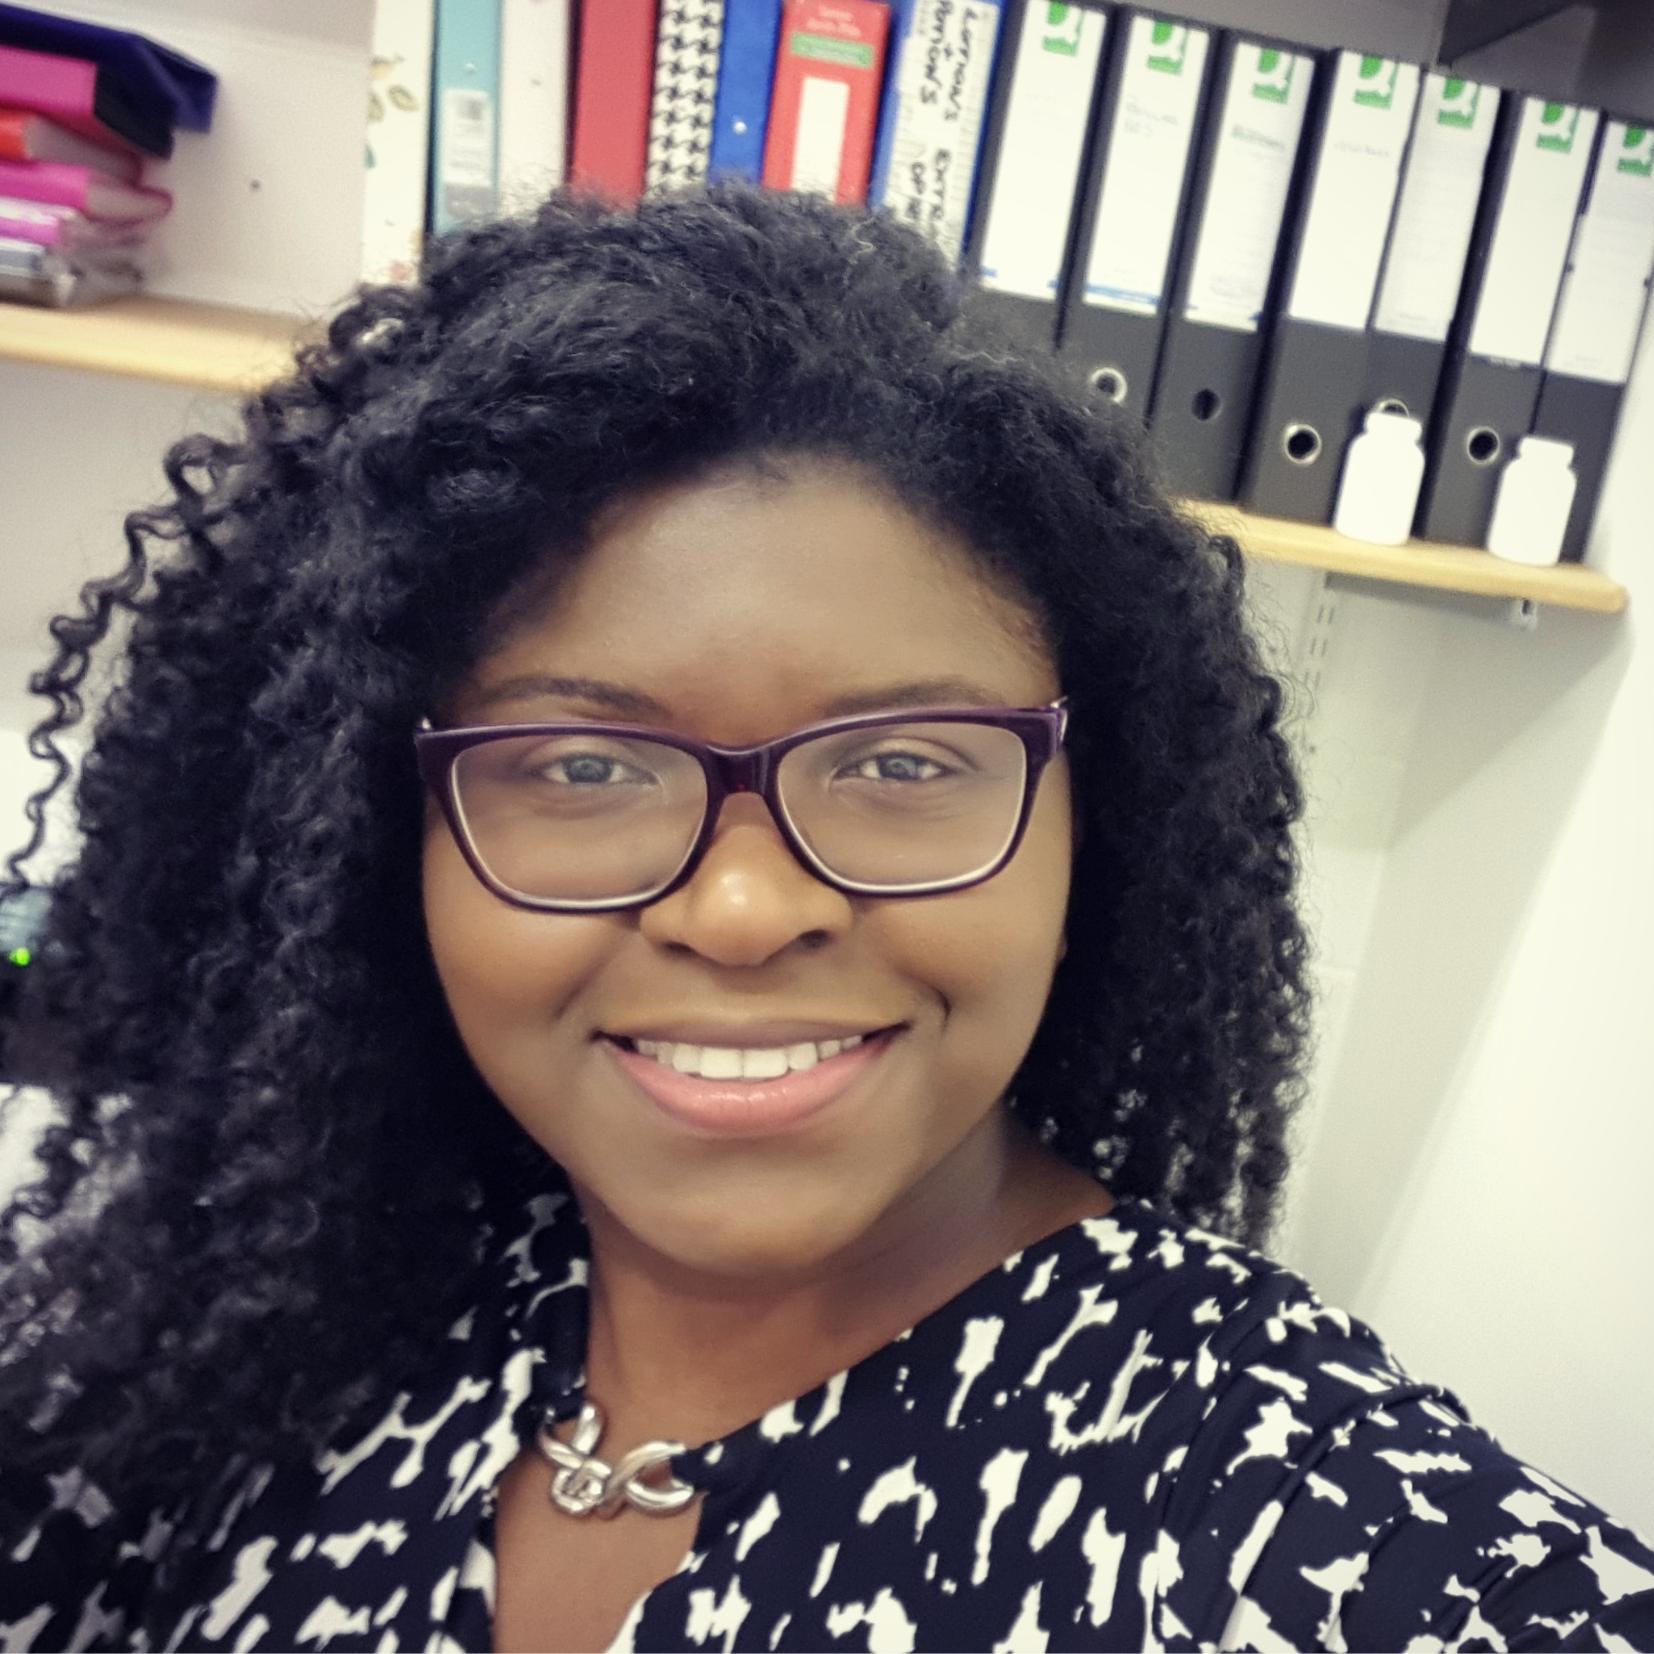 Hermine Mbiku Kinkela, founder of Mbikudi - Naturally Powerful